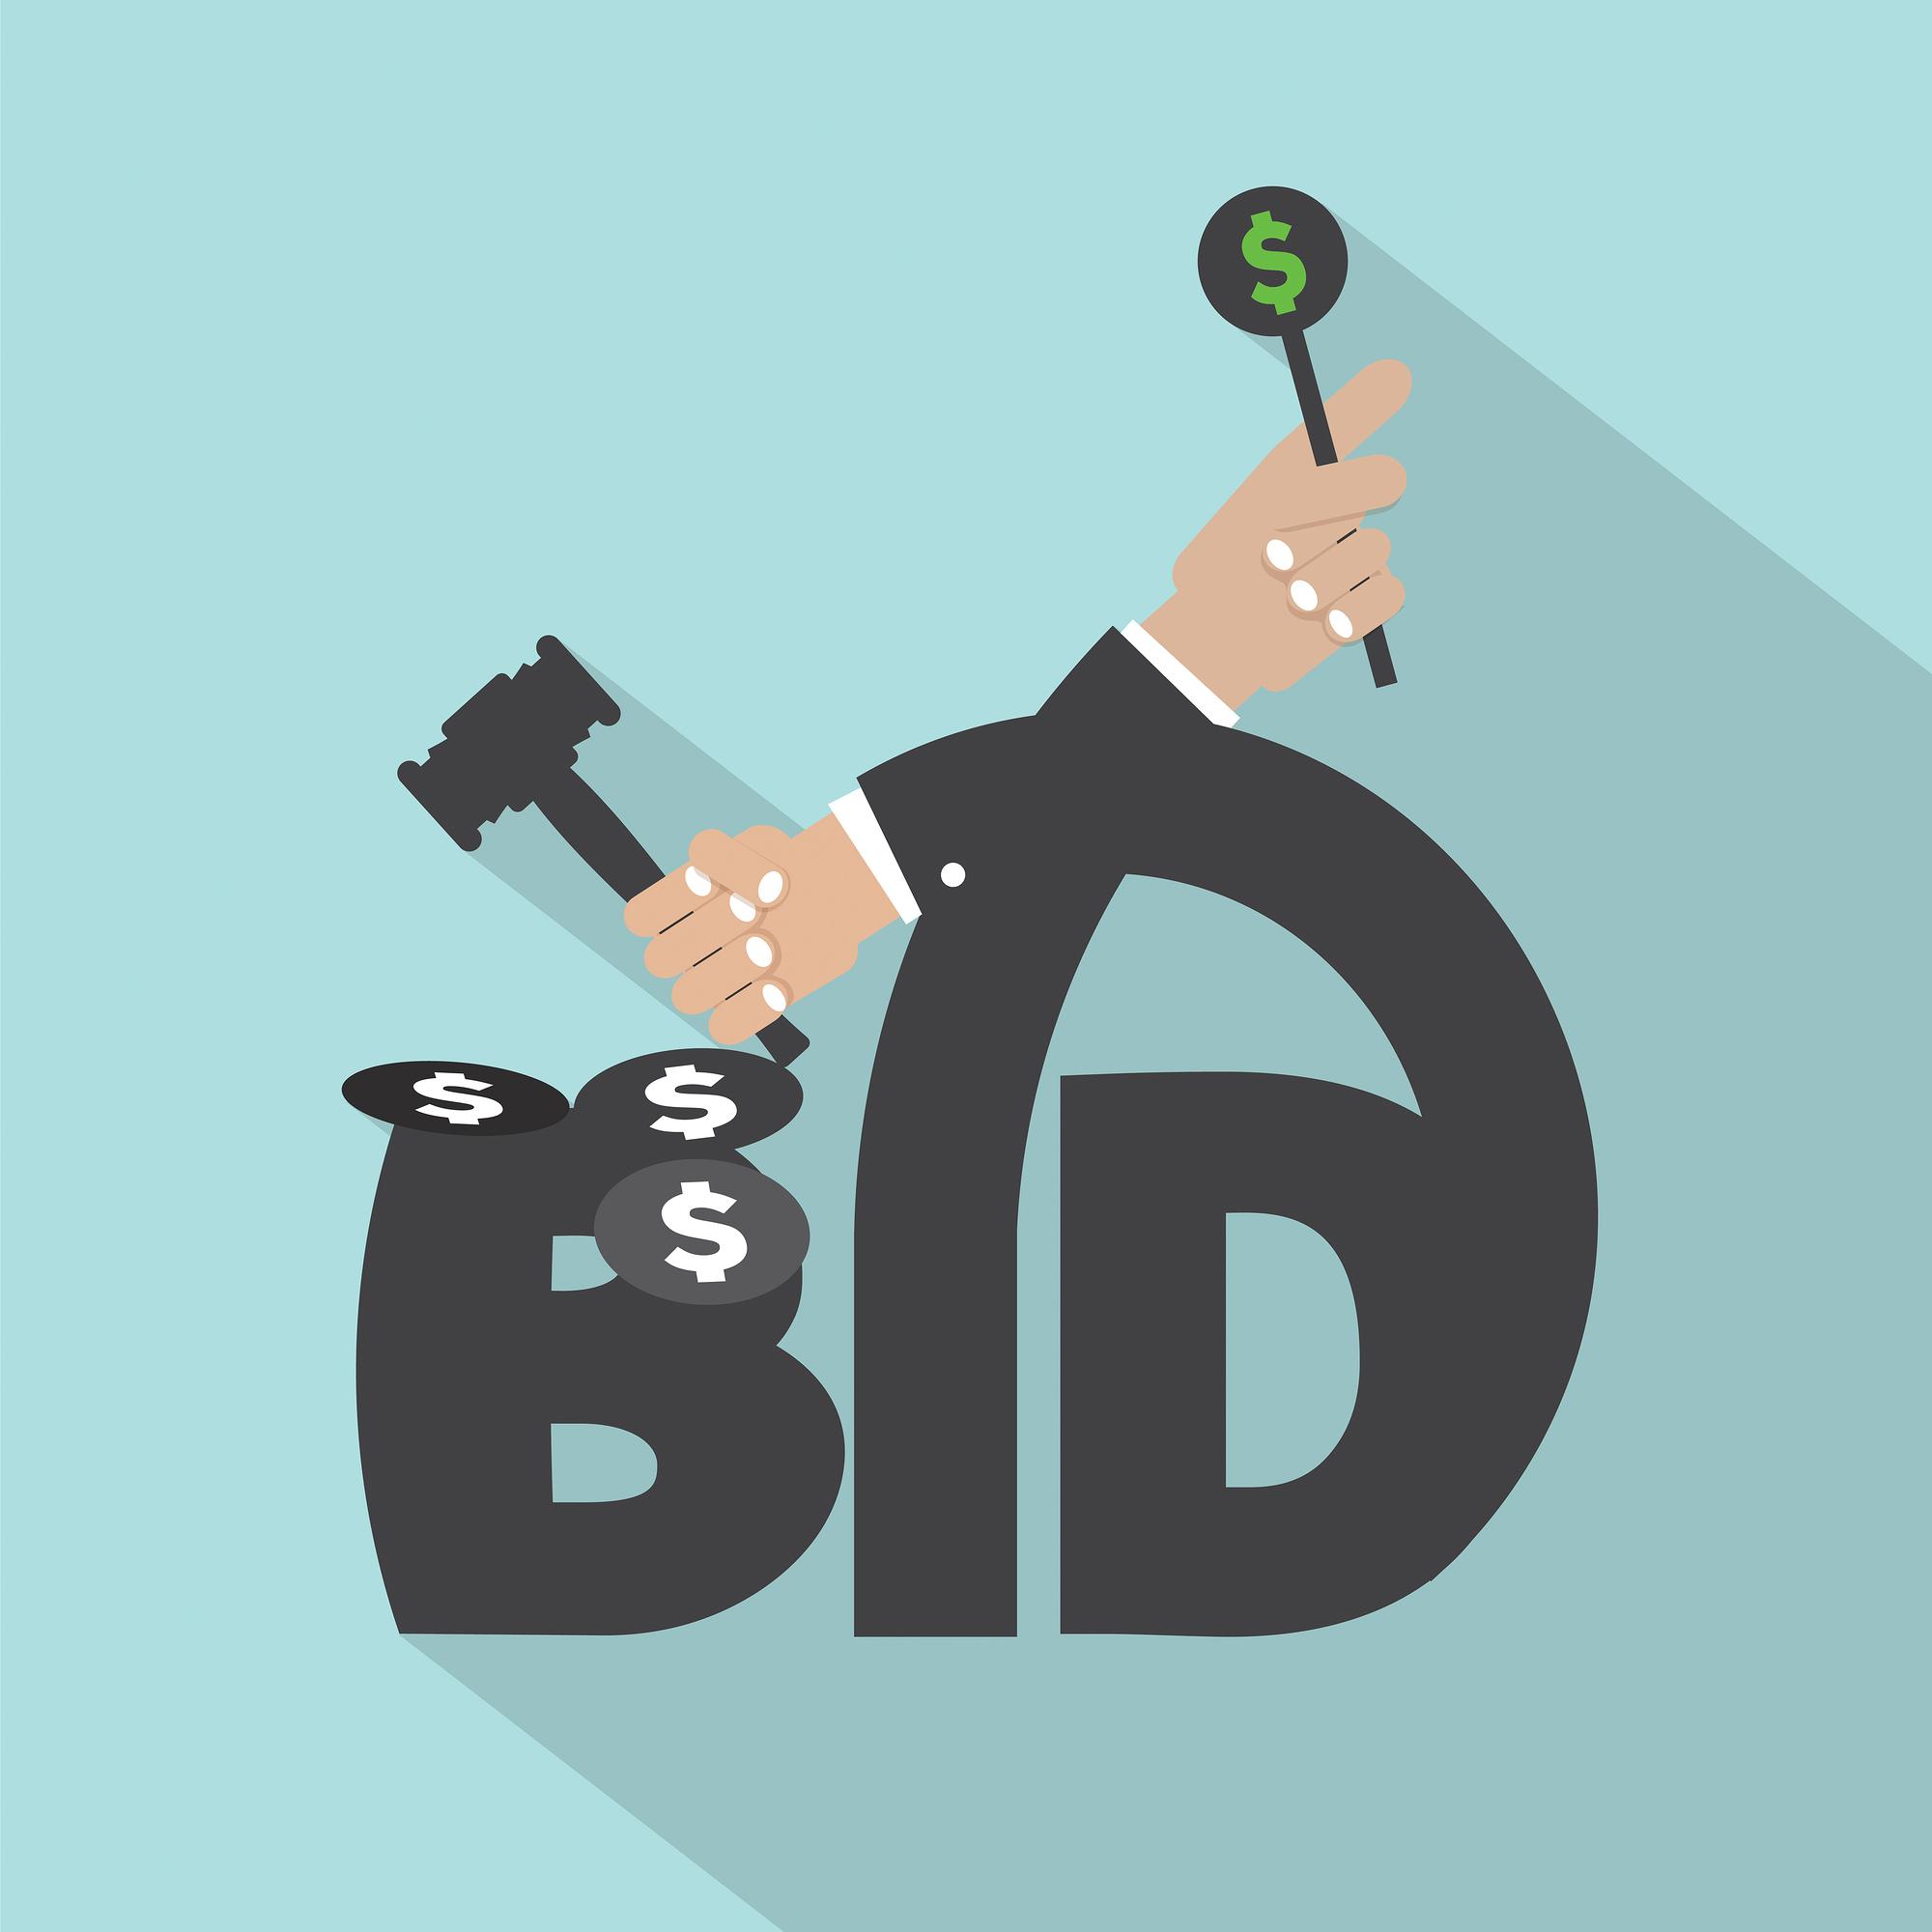 Jordan 23 google office Bulls Header Bidding Explained Preciosbajosco Header Bidding Explained Oarex Capital Markets